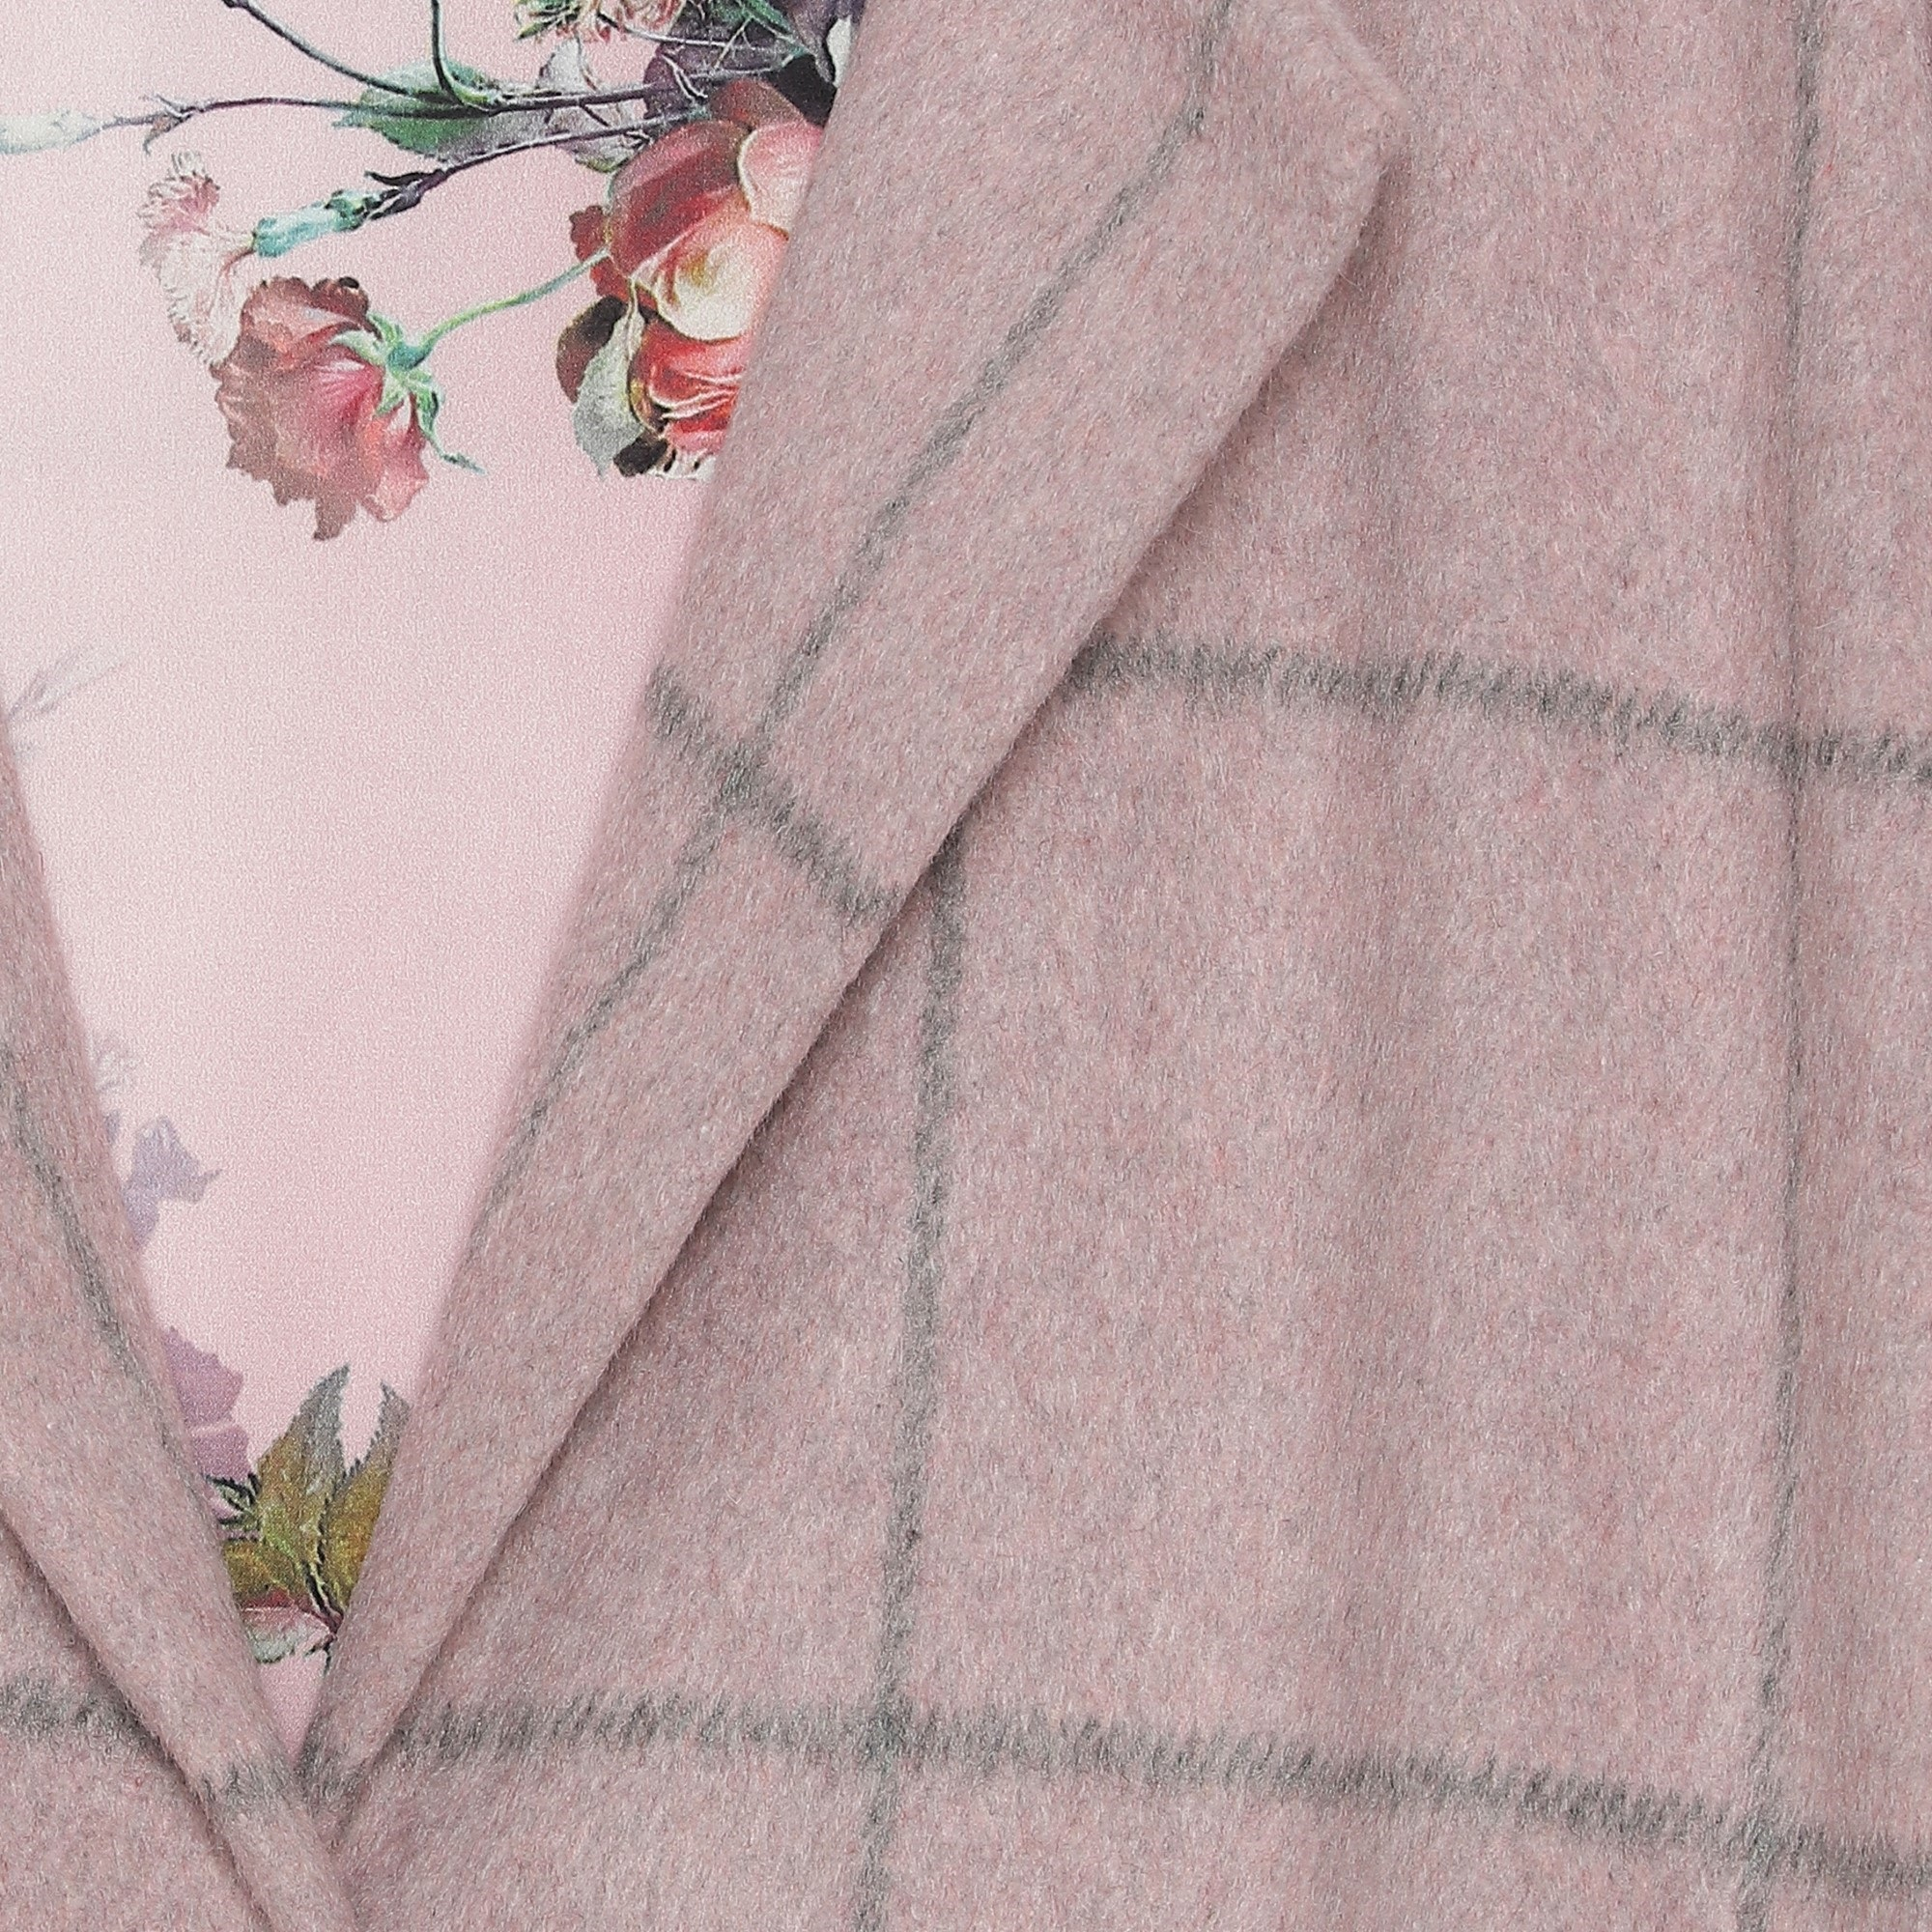 KARMAMIA Kennedy Jacket – no. 29 (limited) IMAGE BY ME